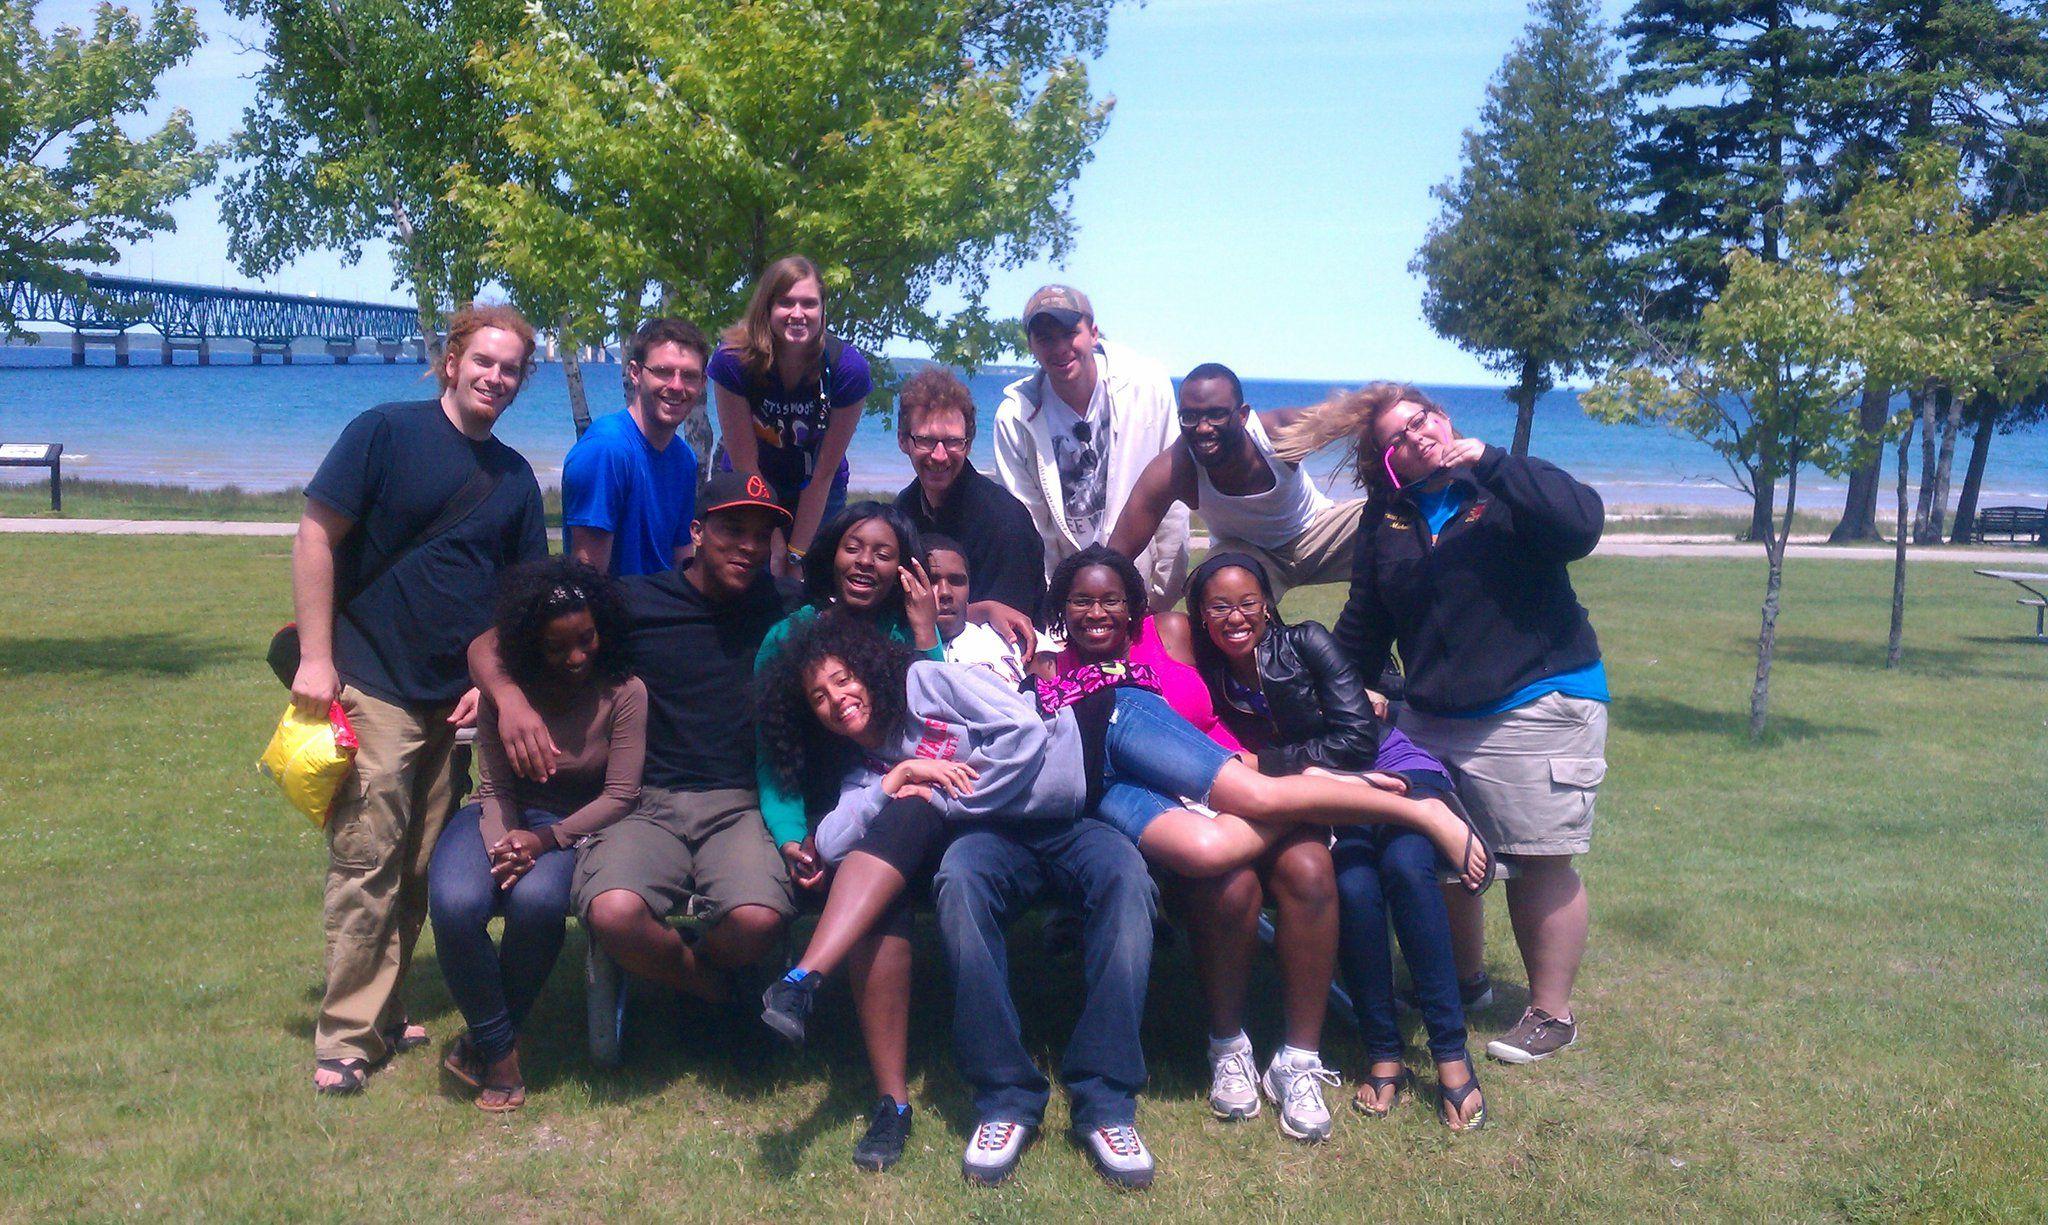 Camp Life at its best 2k11.  Holly, MI. BKB Academy.  Camp Incitatos.  All Staff.